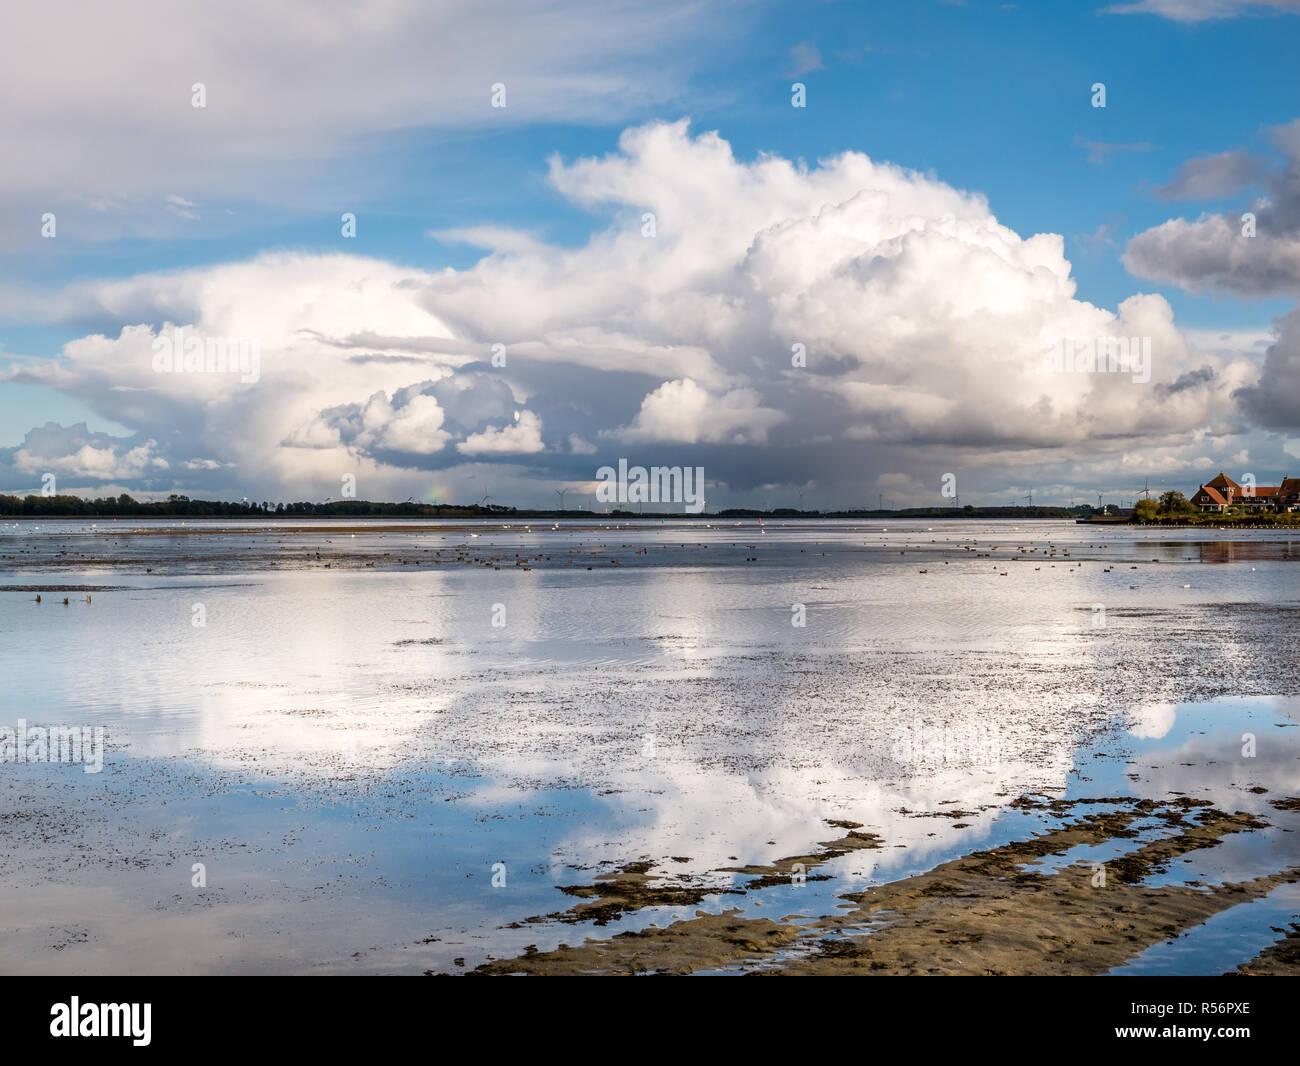 Rain clouds, cumulonimbus, over Gooimeer Lake near Huizen, Netherlands - Stock Image